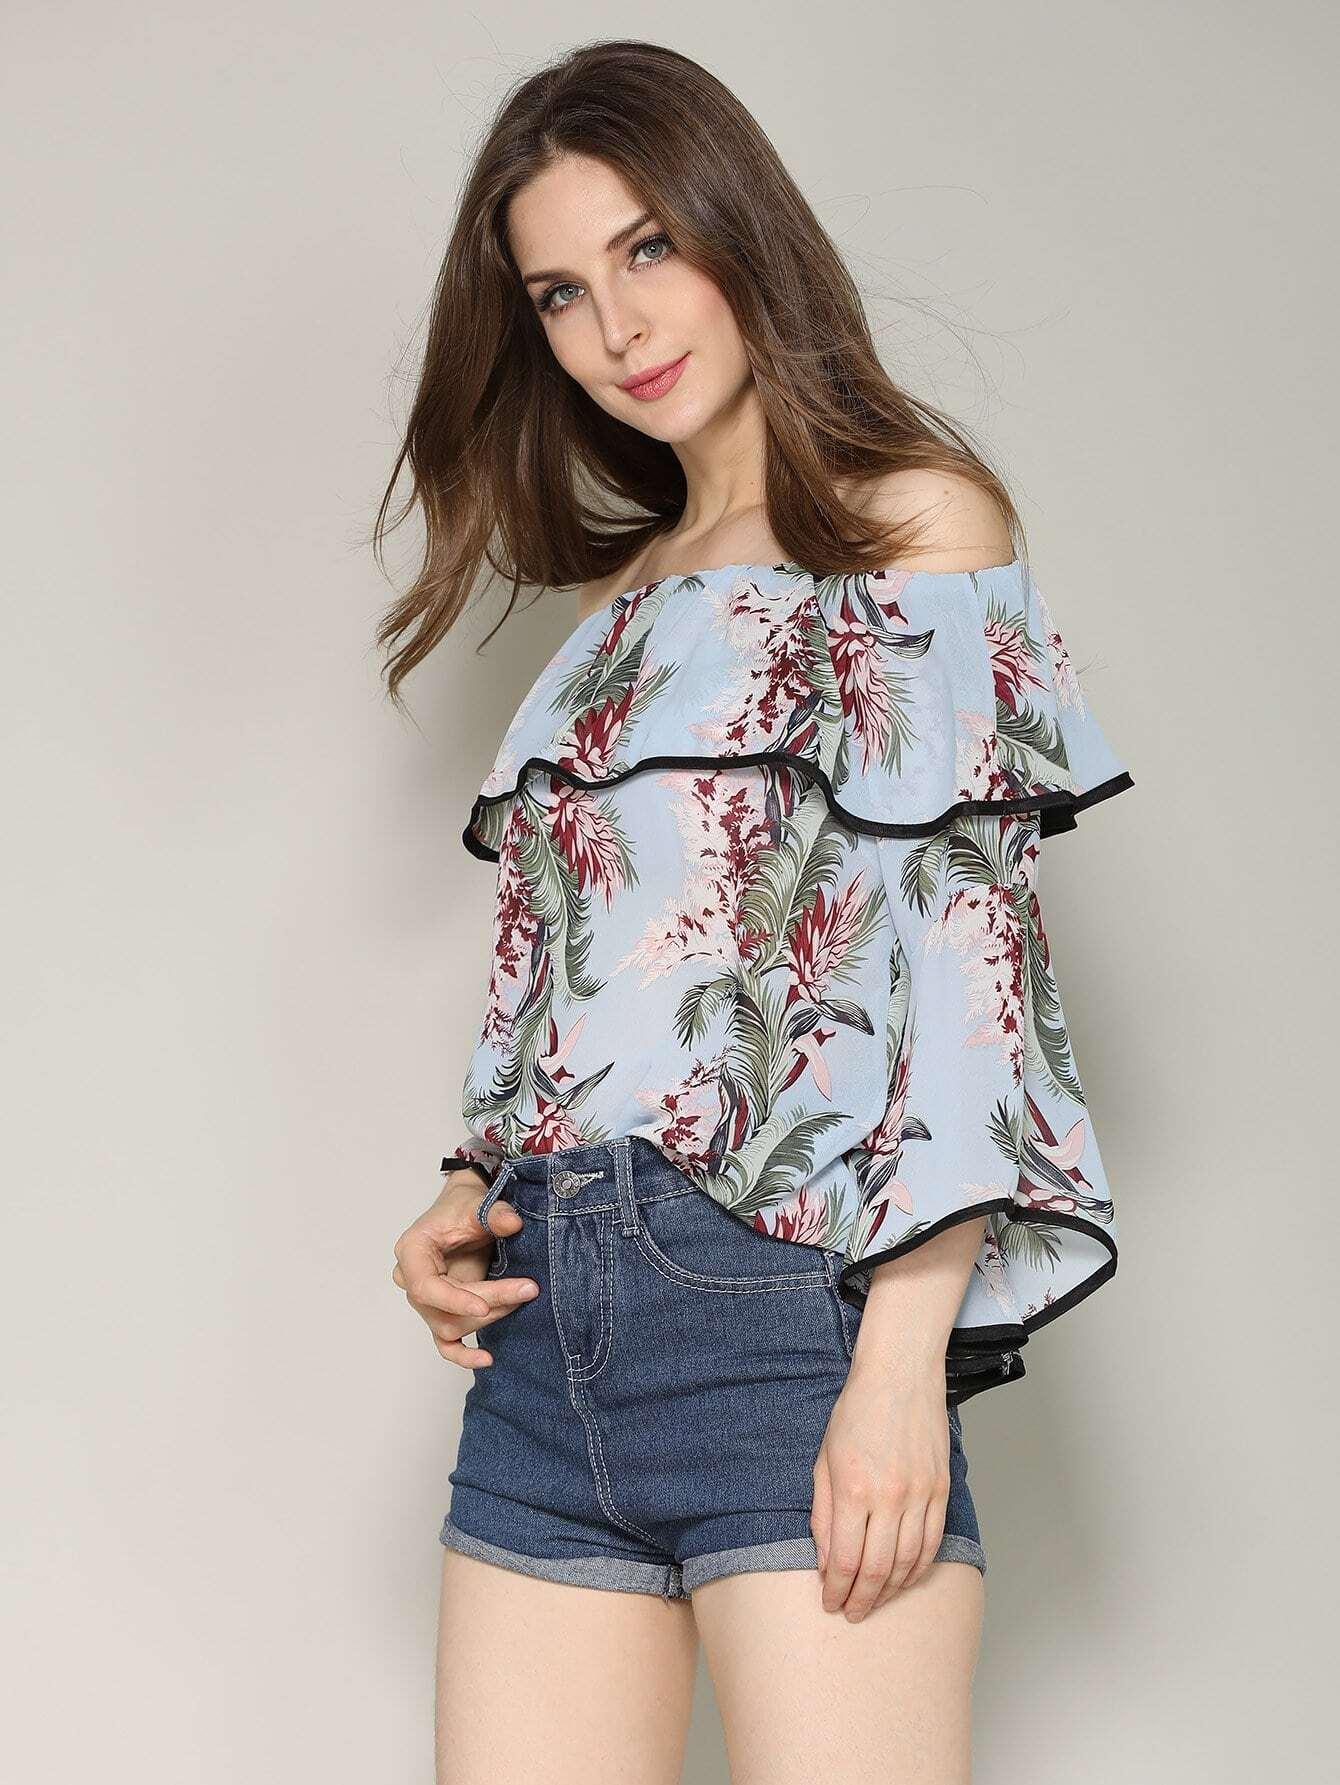 Floral Print Off Shoulder Ruffle Top fashionable floral print off the shoulder ruffle top for women